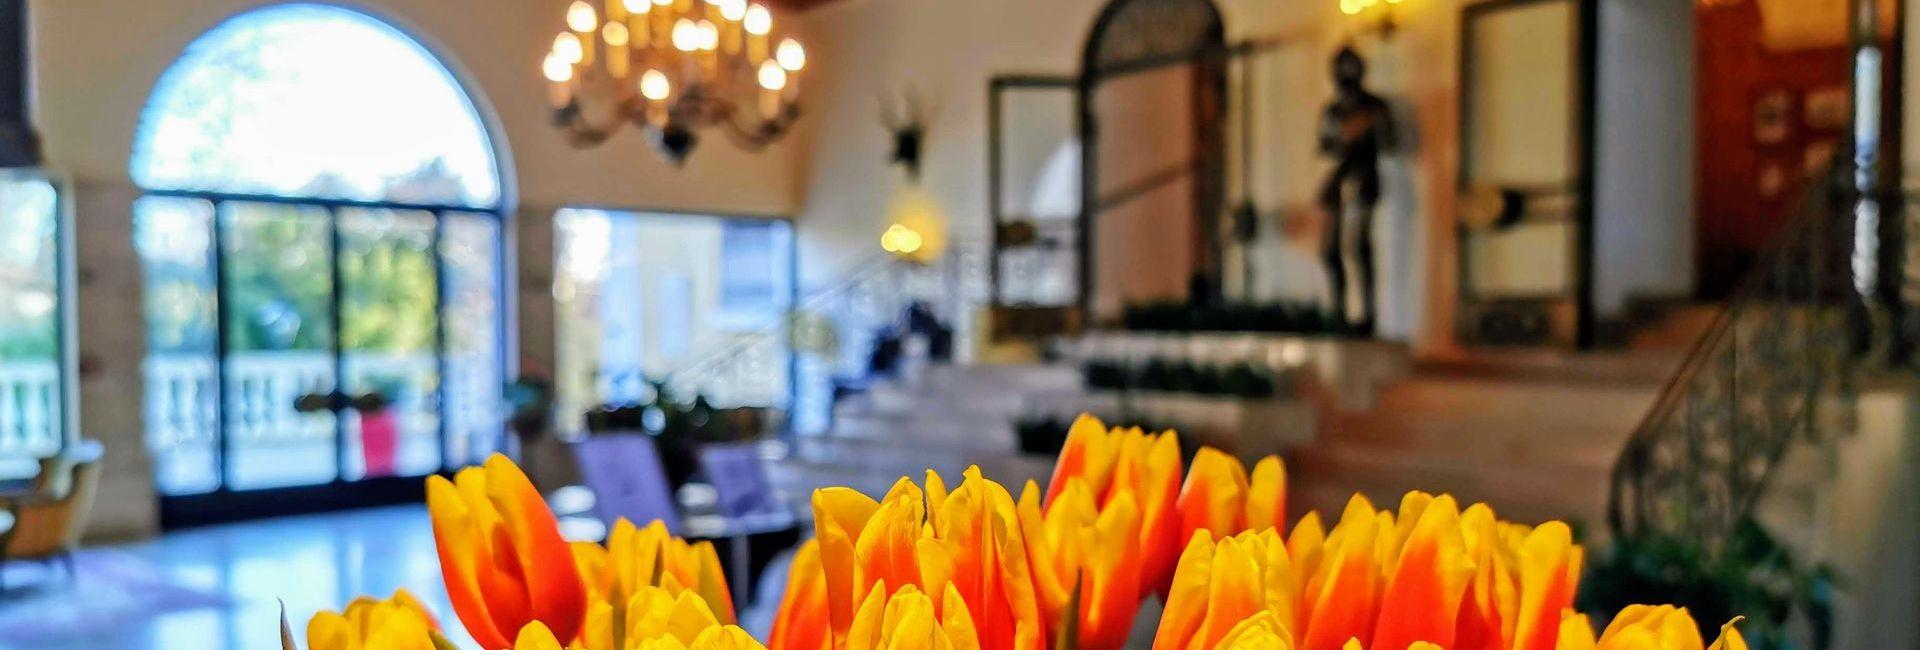 Lobby of Castle Hotel Weikersdorf